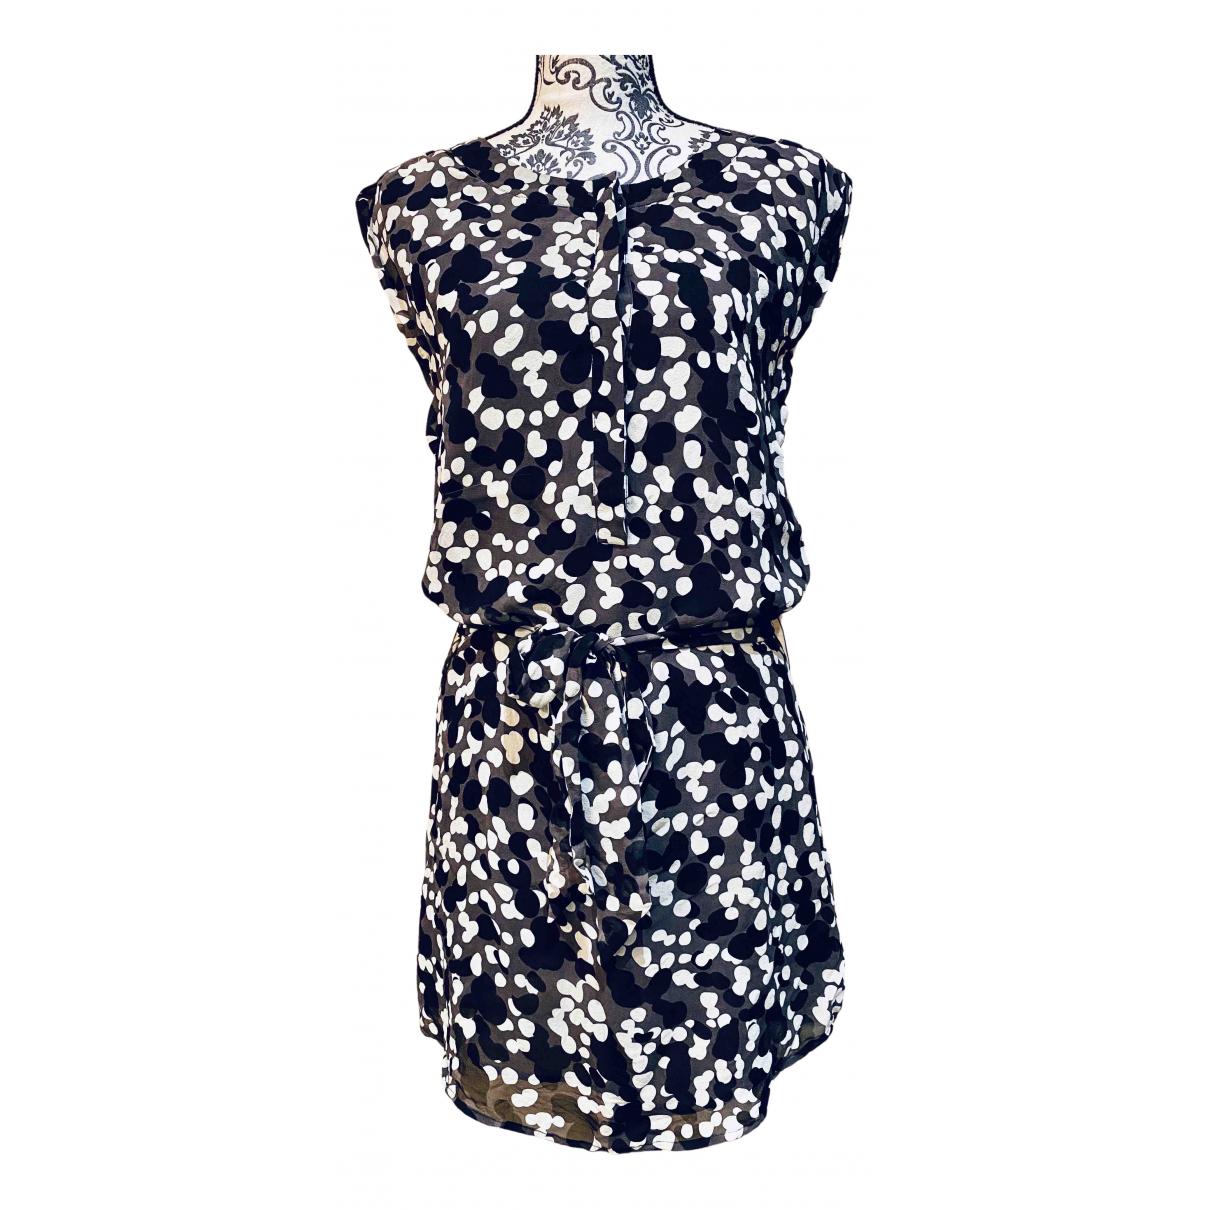 Sud Express \N Black Silk dress for Women 36 FR